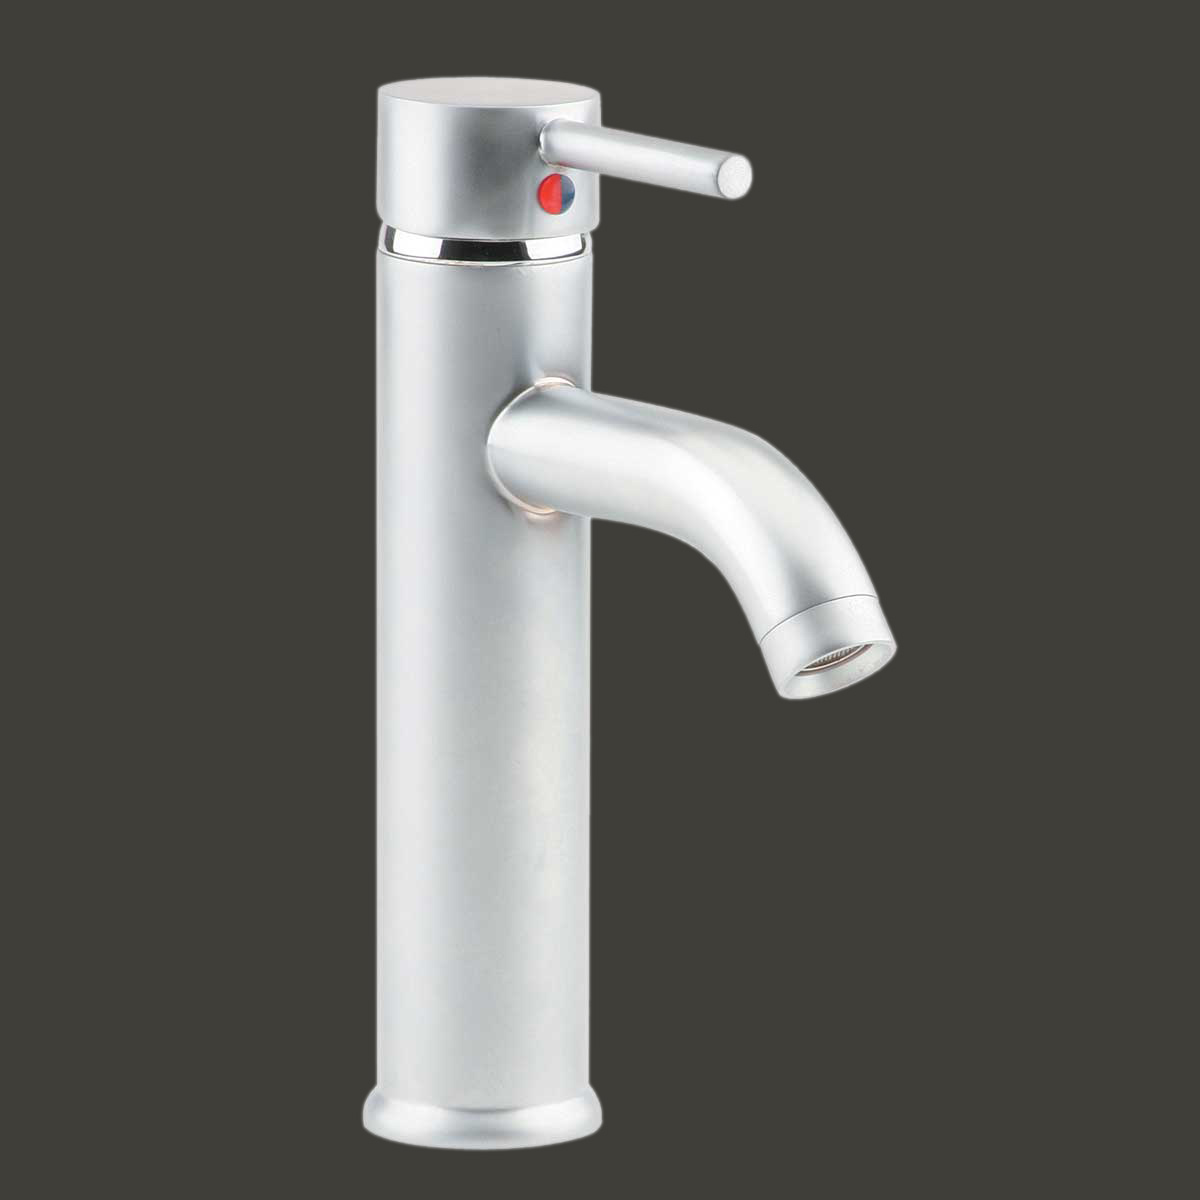 Satin Nickel Single Hole Bathroom Sink Faucet 9.5\